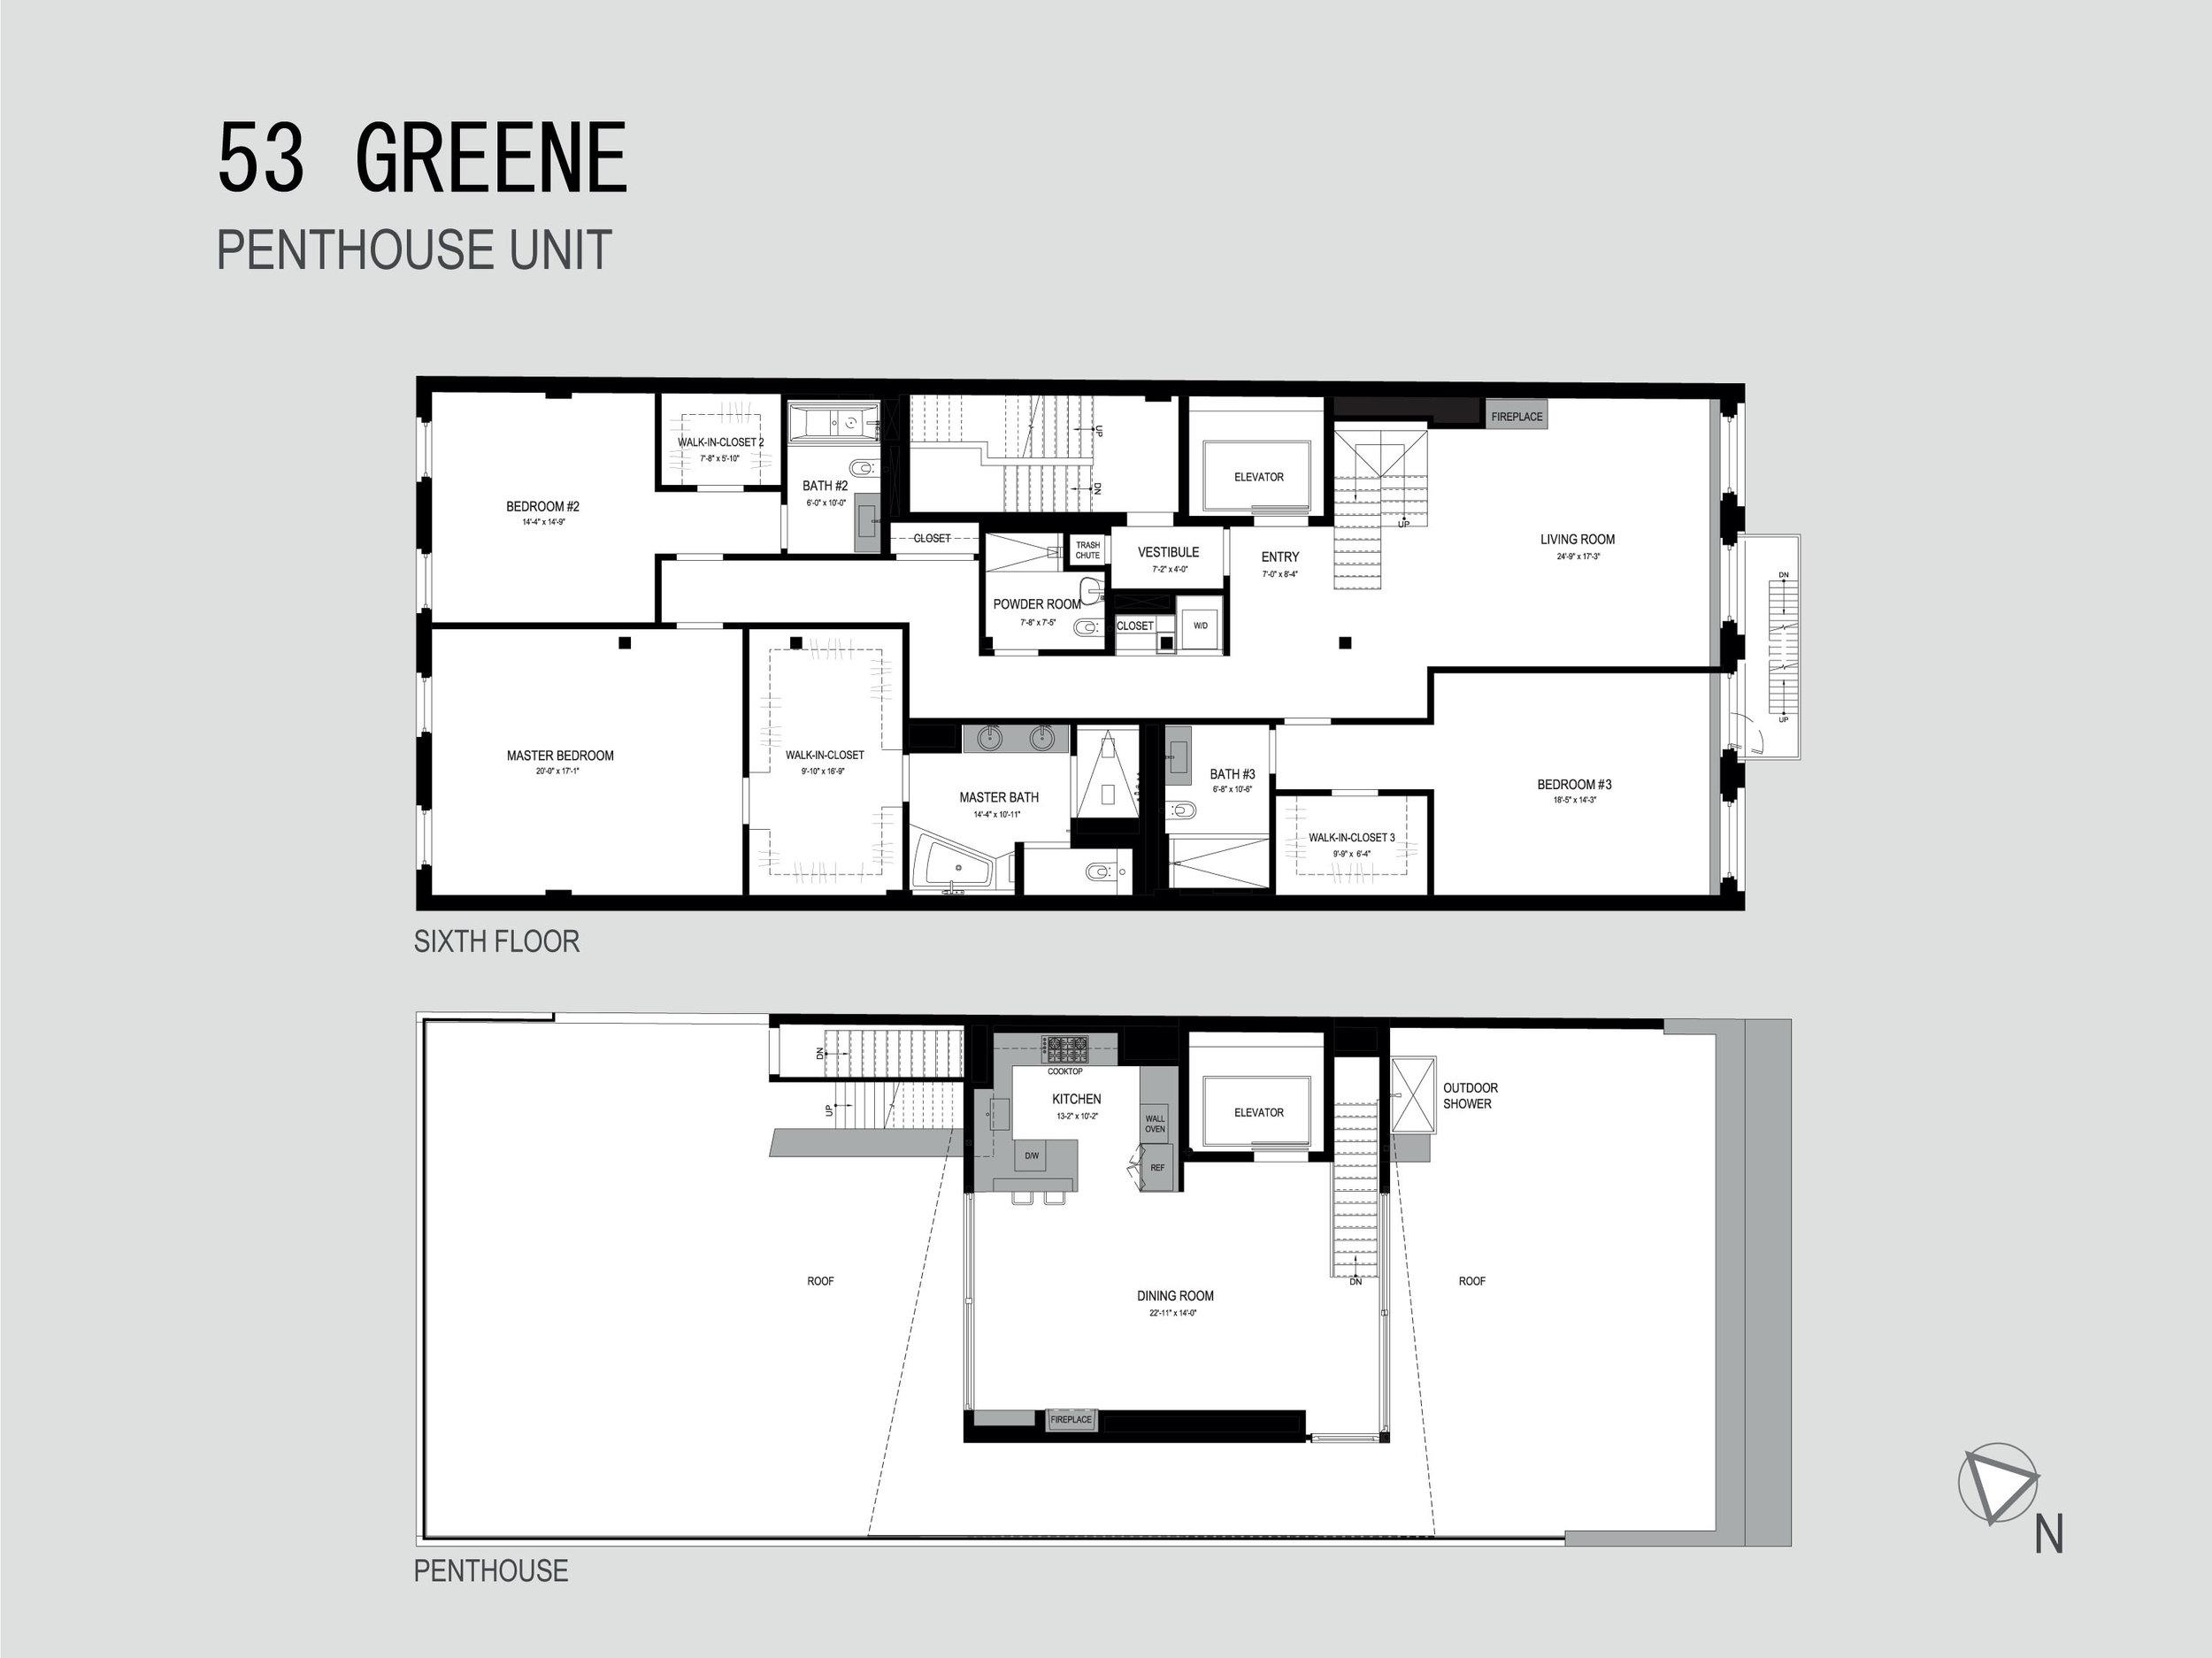 53 Greene_PH Plans.jpg